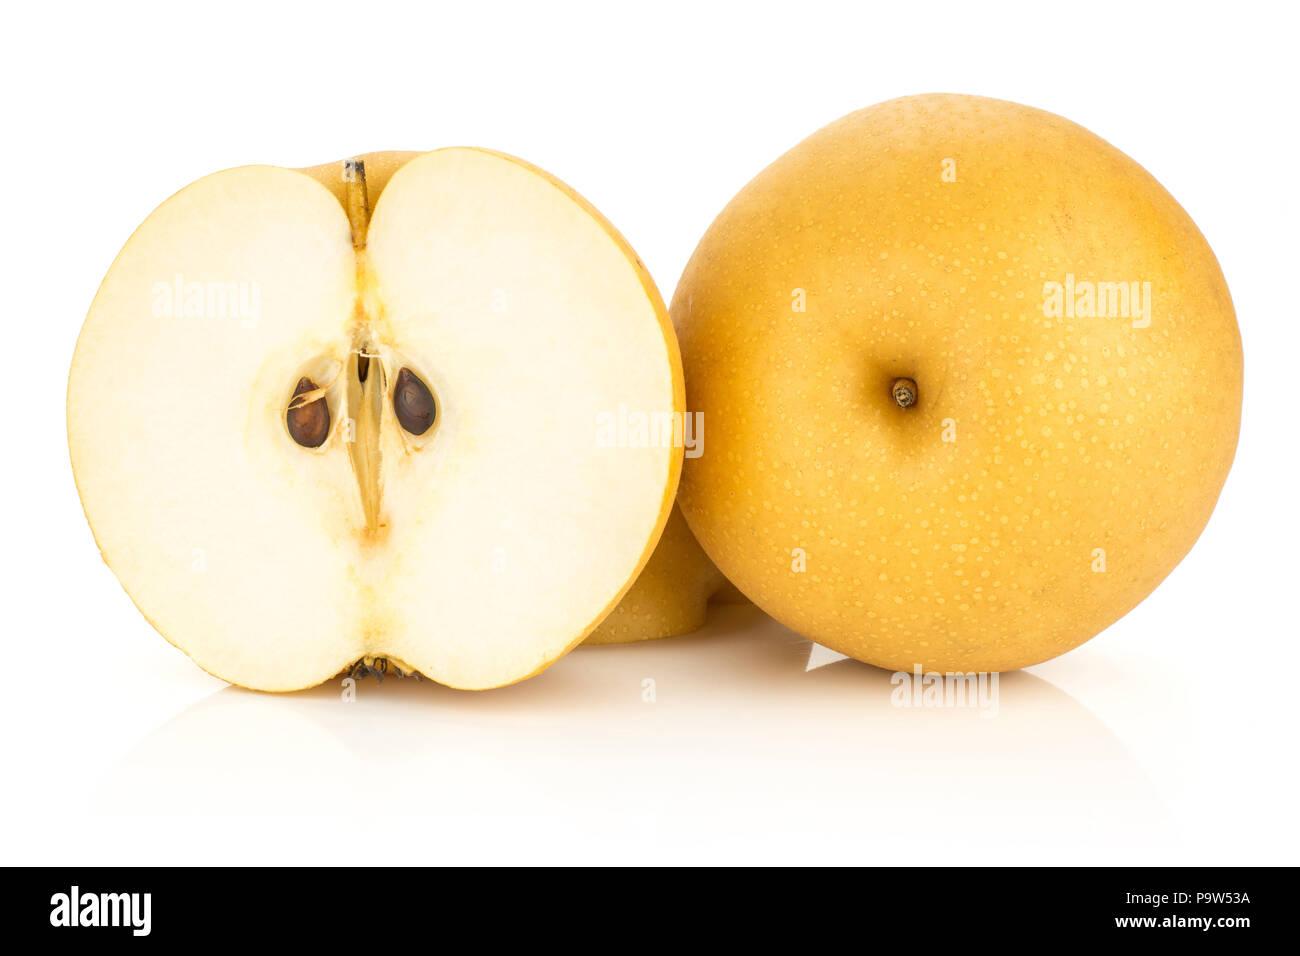 Asian golden pears